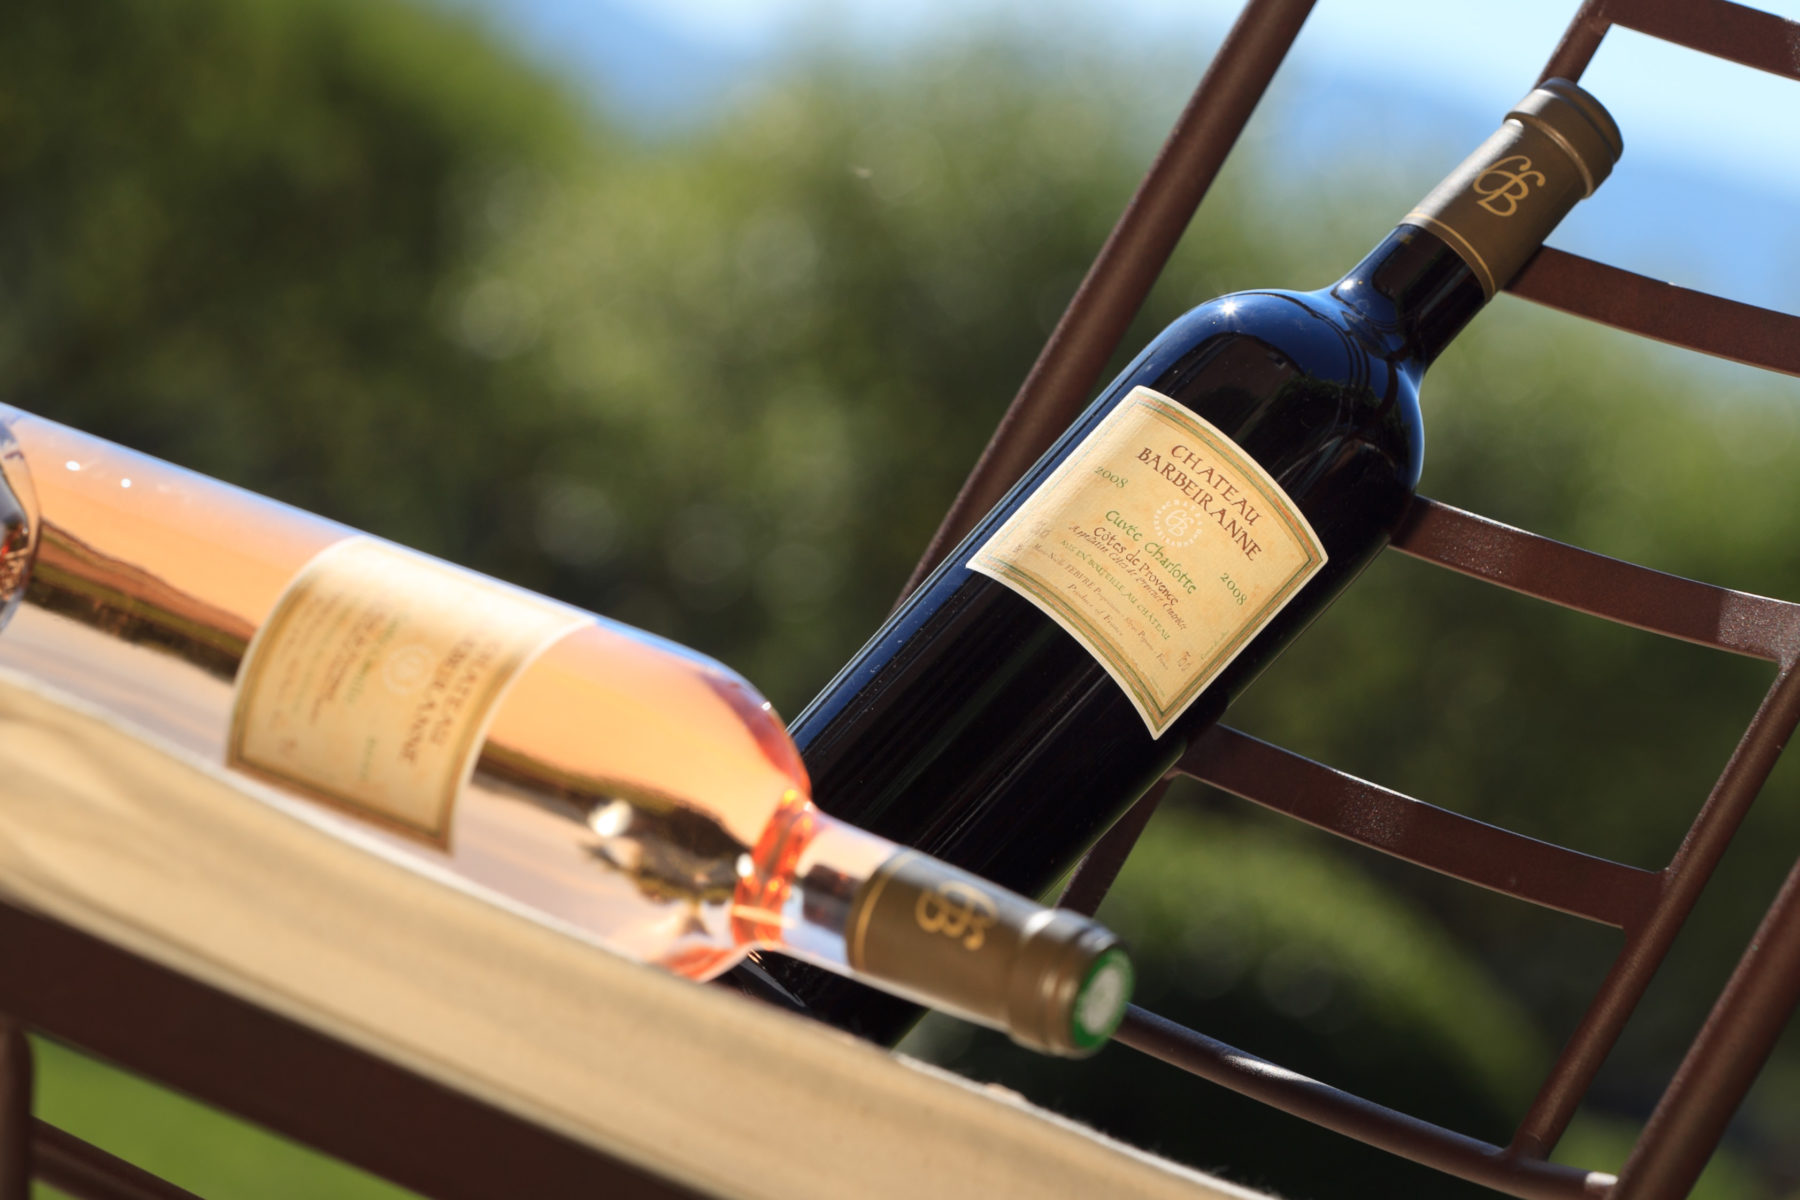 Afbeeldingsresultaat voor Château Barbeiranne winery